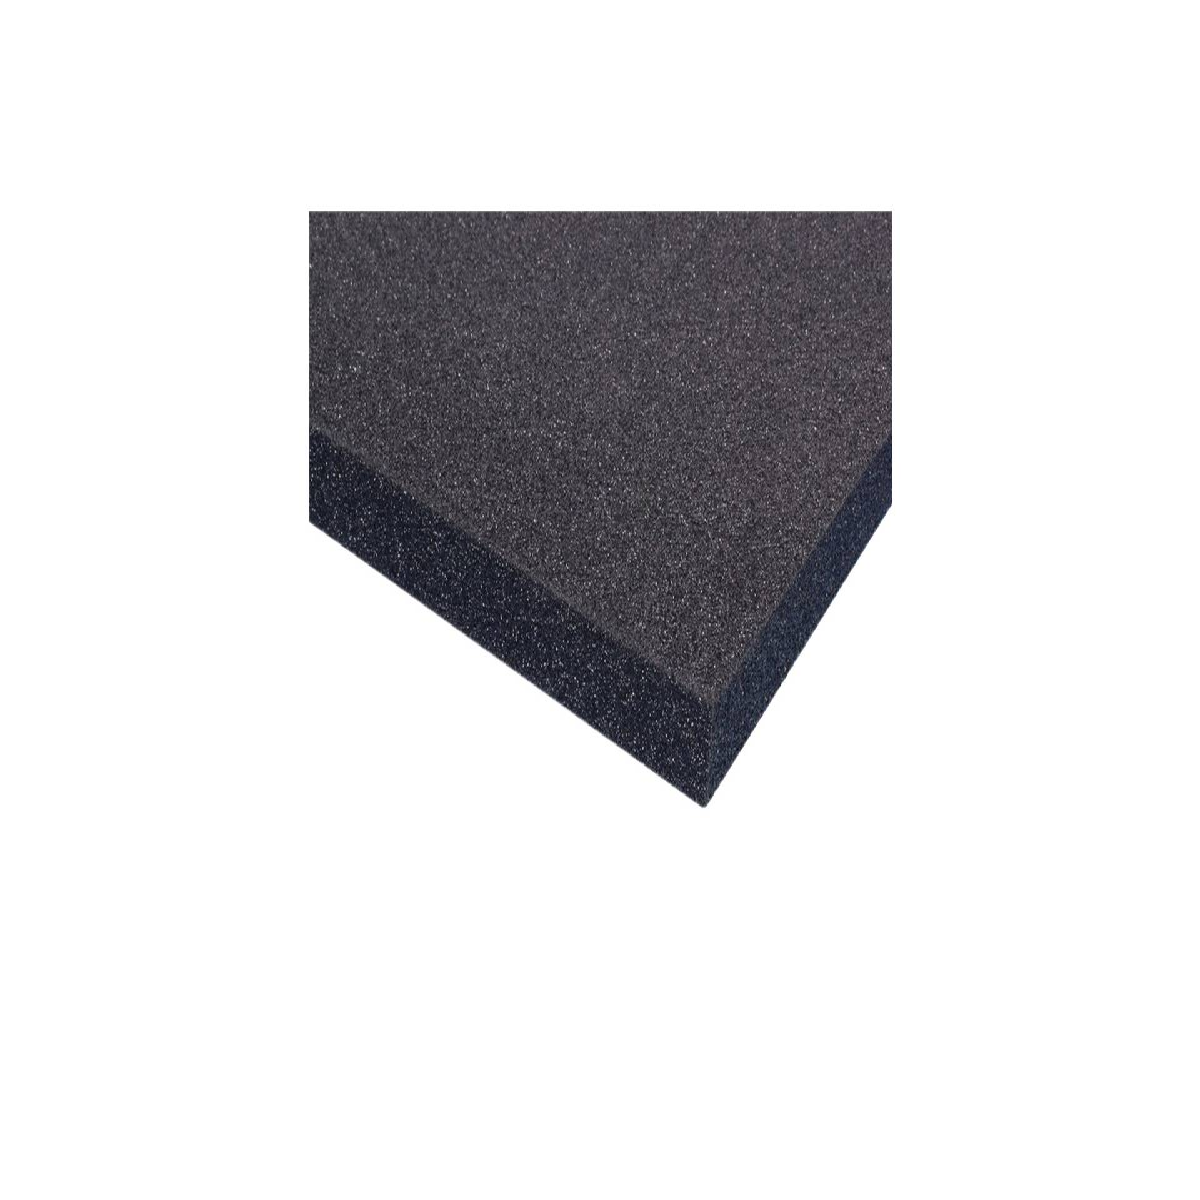 adam hall 019310 sa plastazote ld29 schaumstoff 10 mm selbstklebend. Black Bedroom Furniture Sets. Home Design Ideas